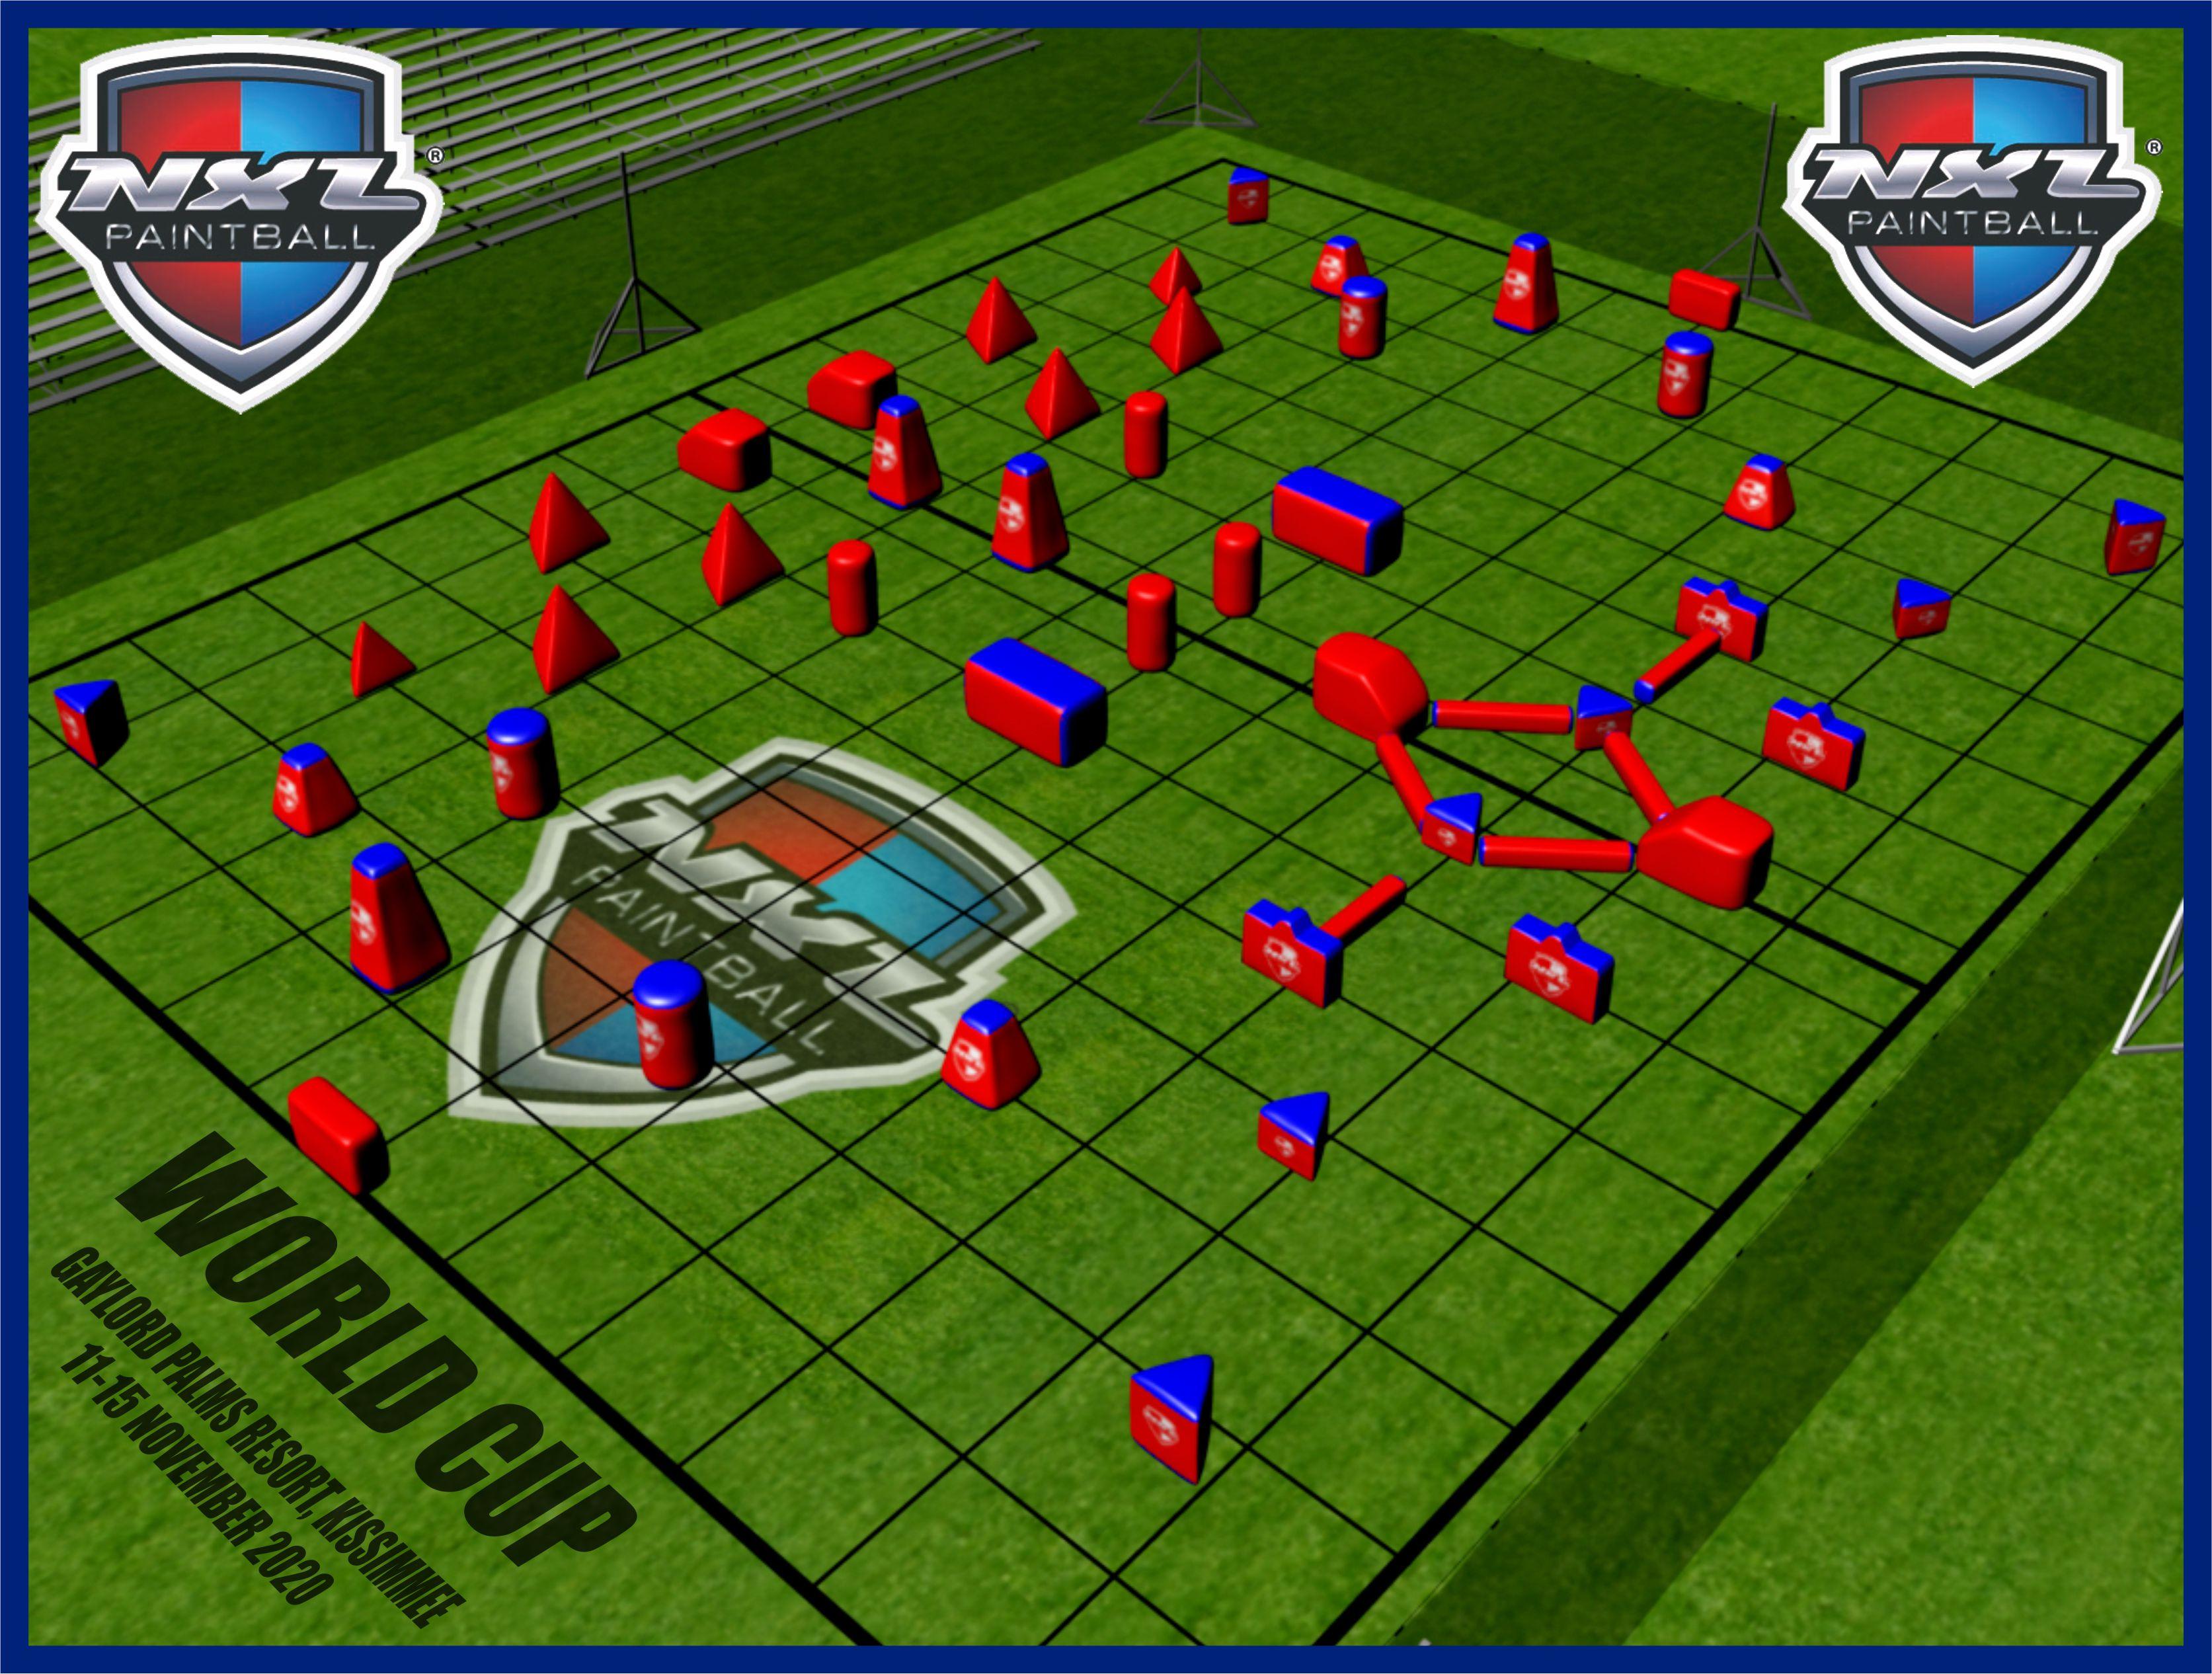 2020nxl WC layout_2.jpg